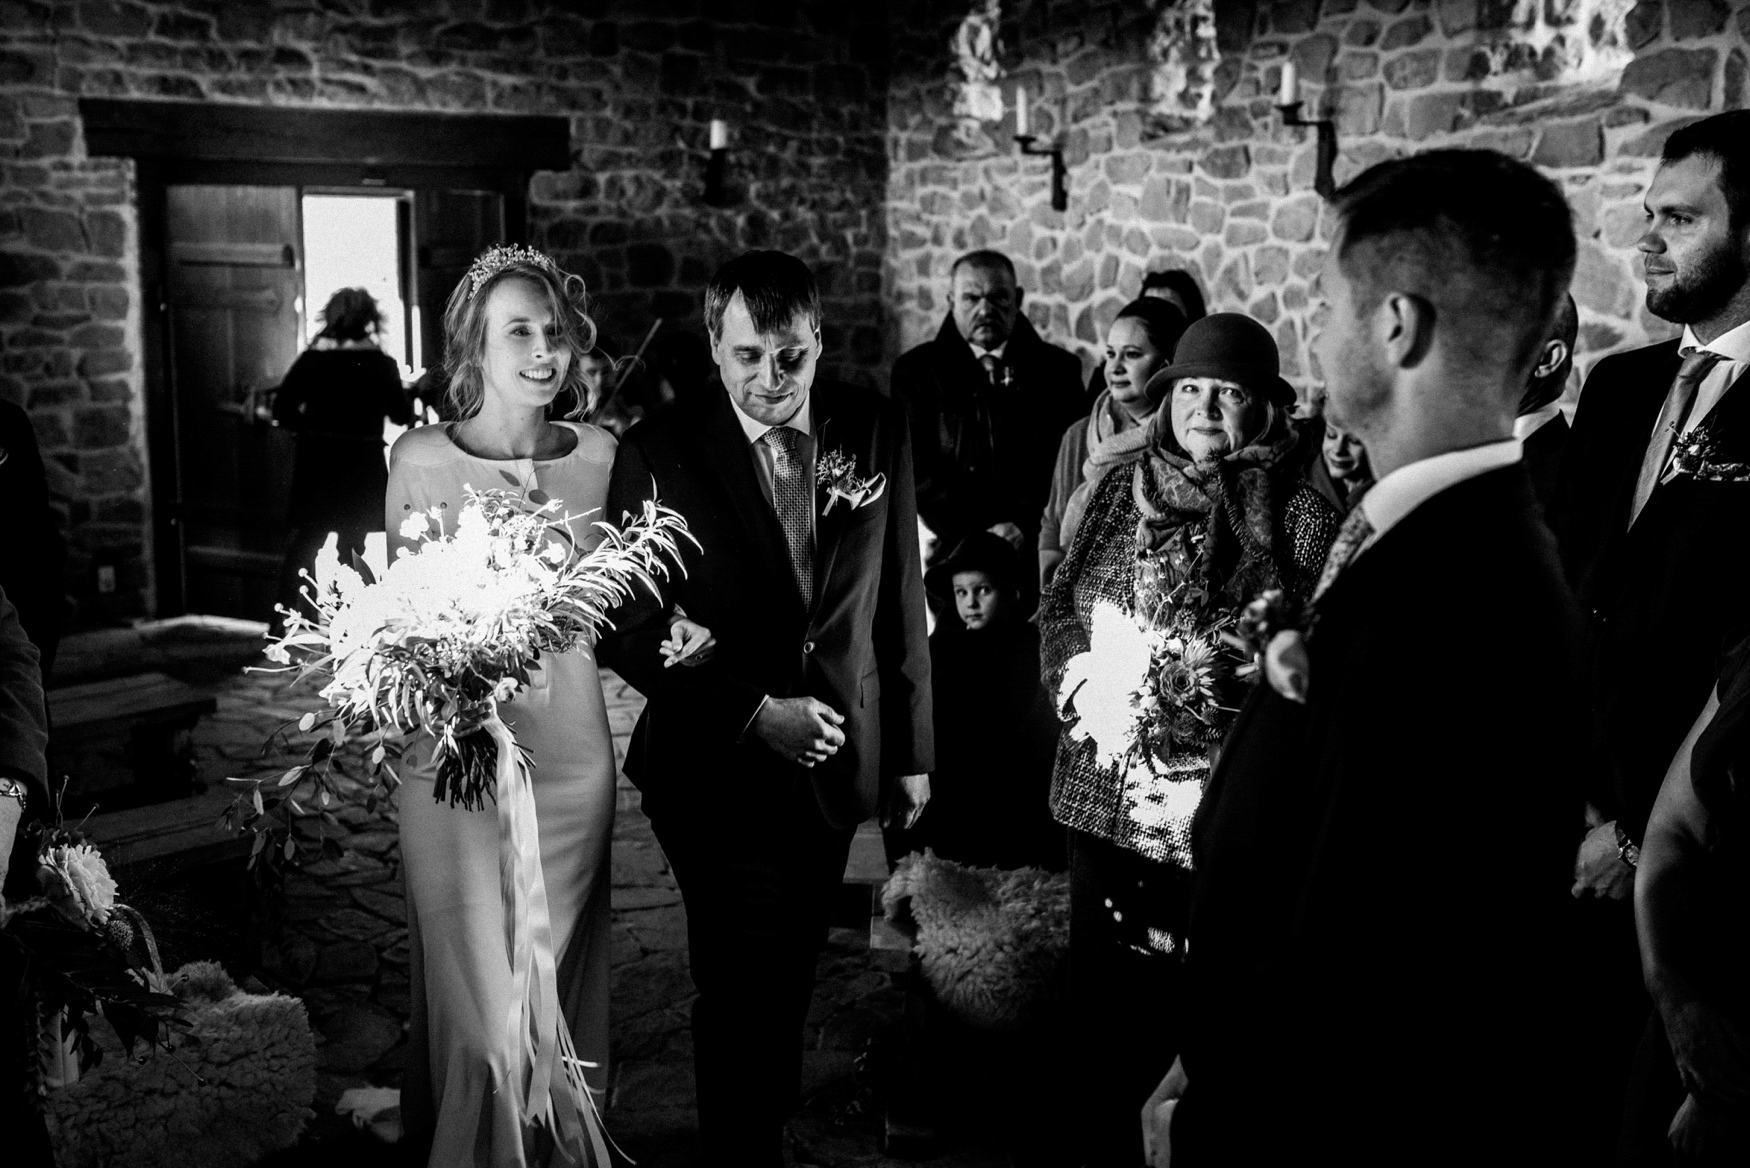 2 prague wedding photographer - boho svatba zikmundov012.jpg